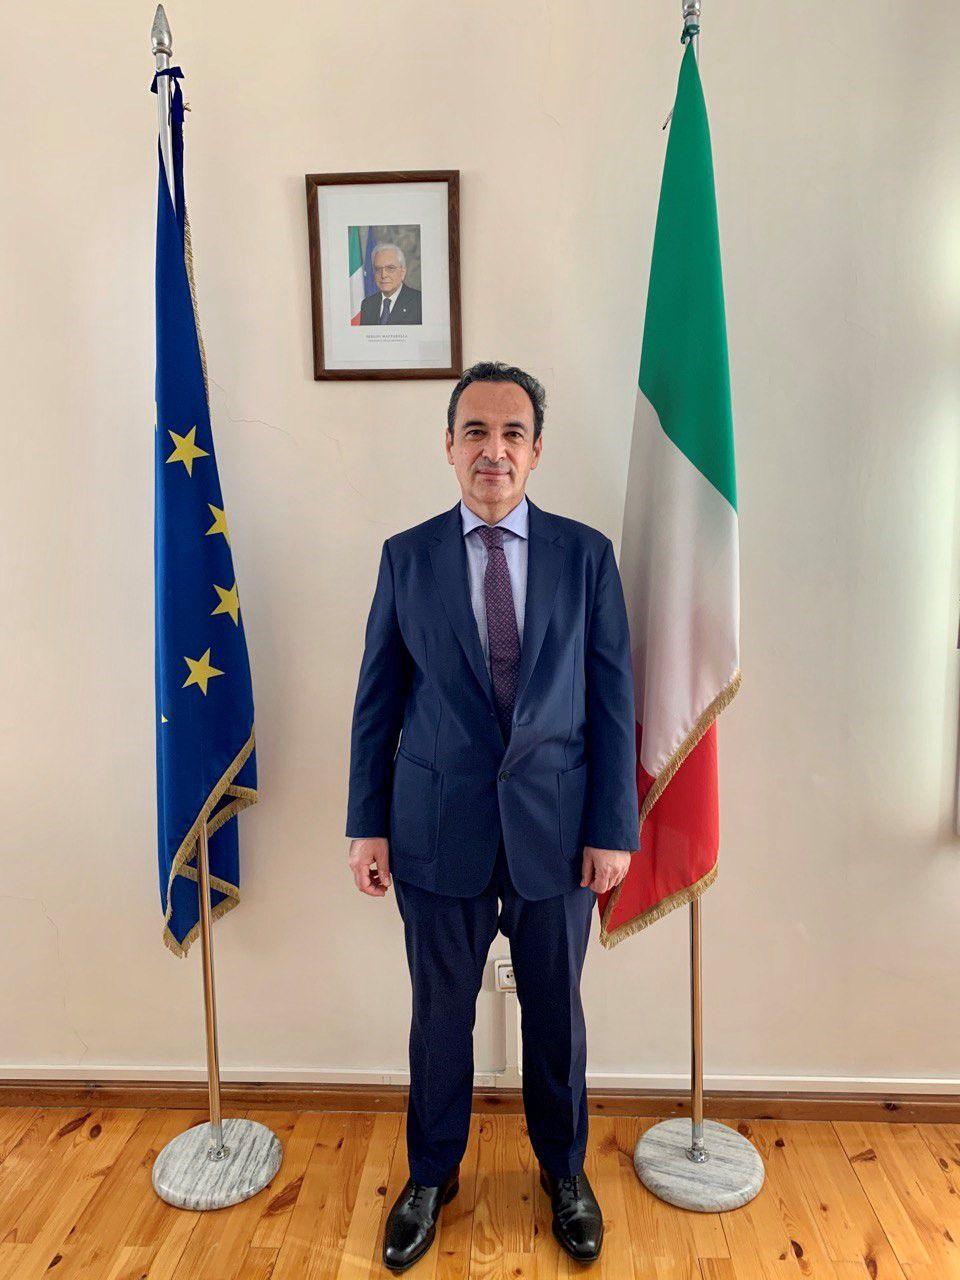 Amb. Agostino Pinna